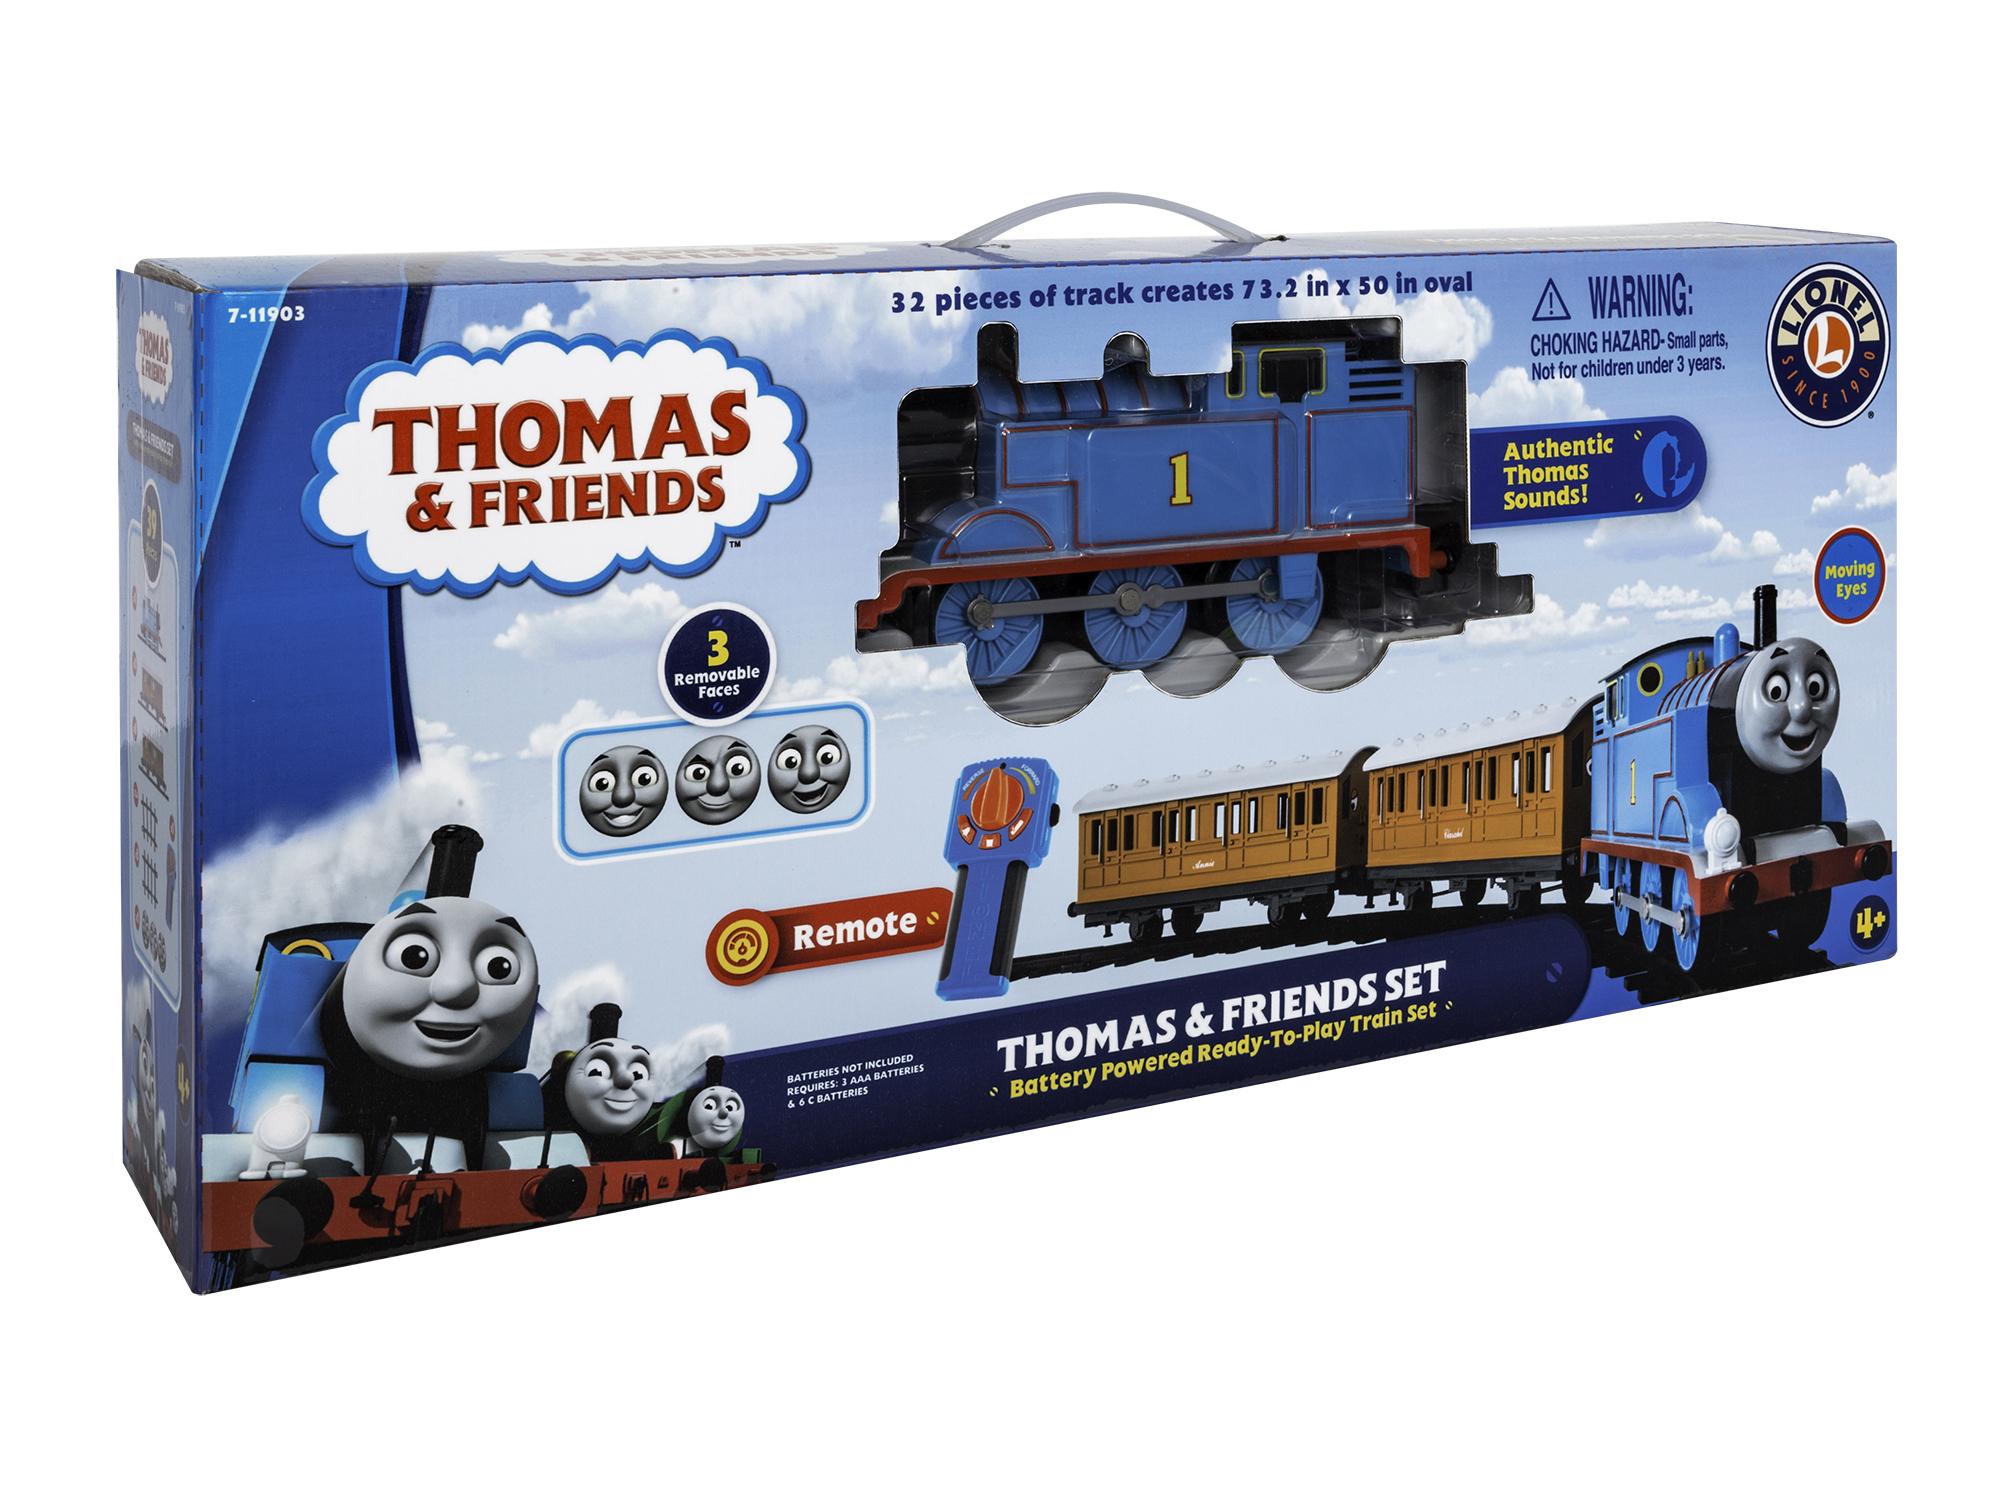 Thomas Friends Ready To Play Set